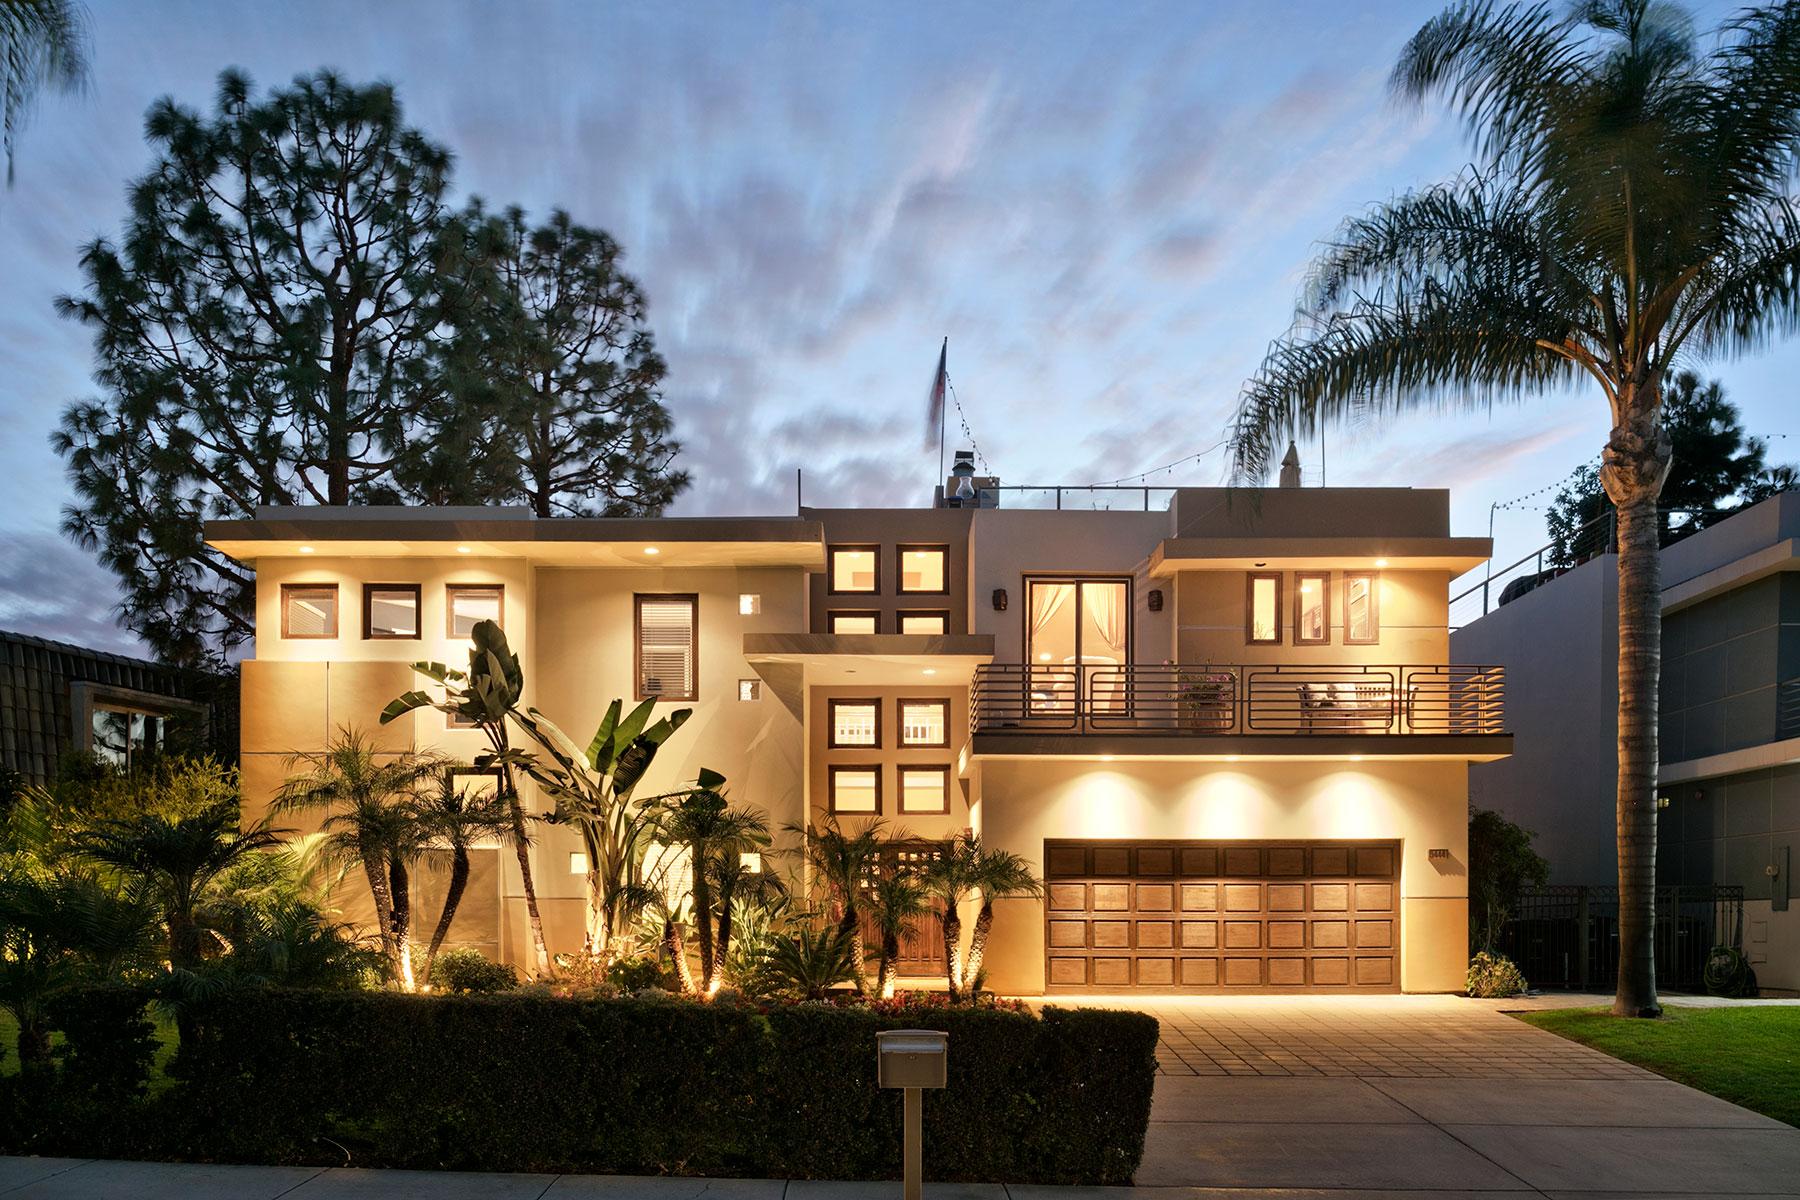 Single Family Home for Sale at 34441 Camino Capistano 34441 Camino Capistrano Dana Point, 92624 United States